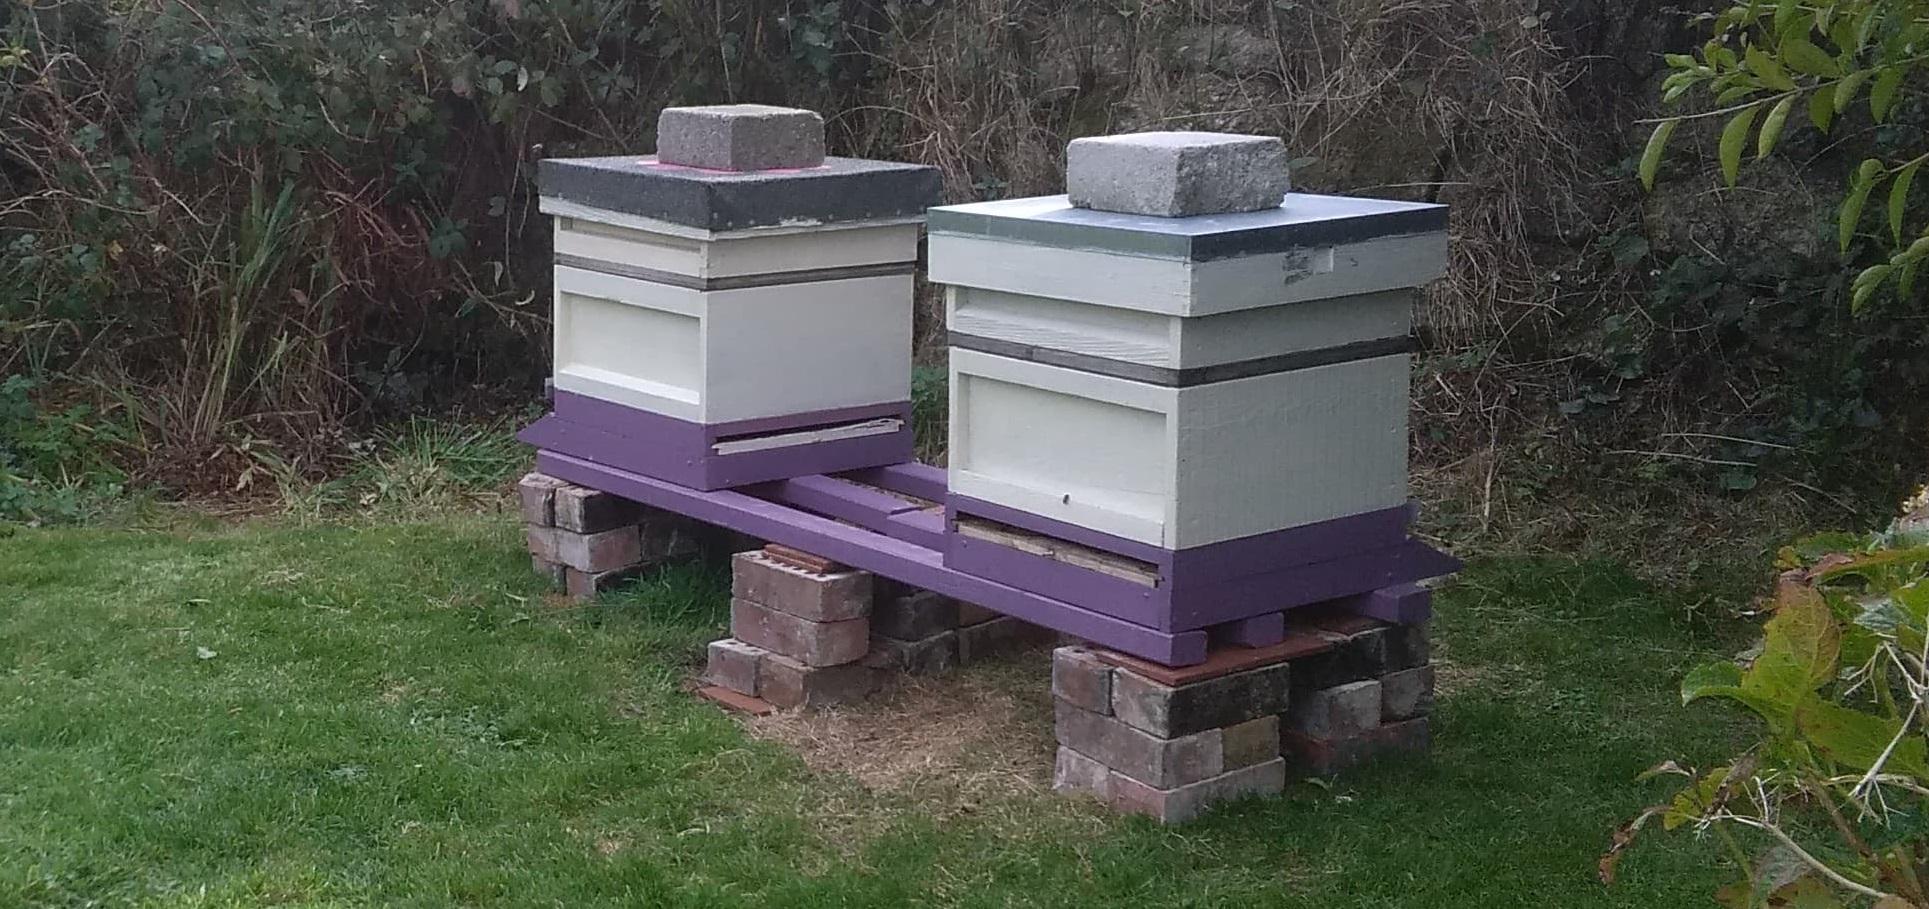 sennen two hives